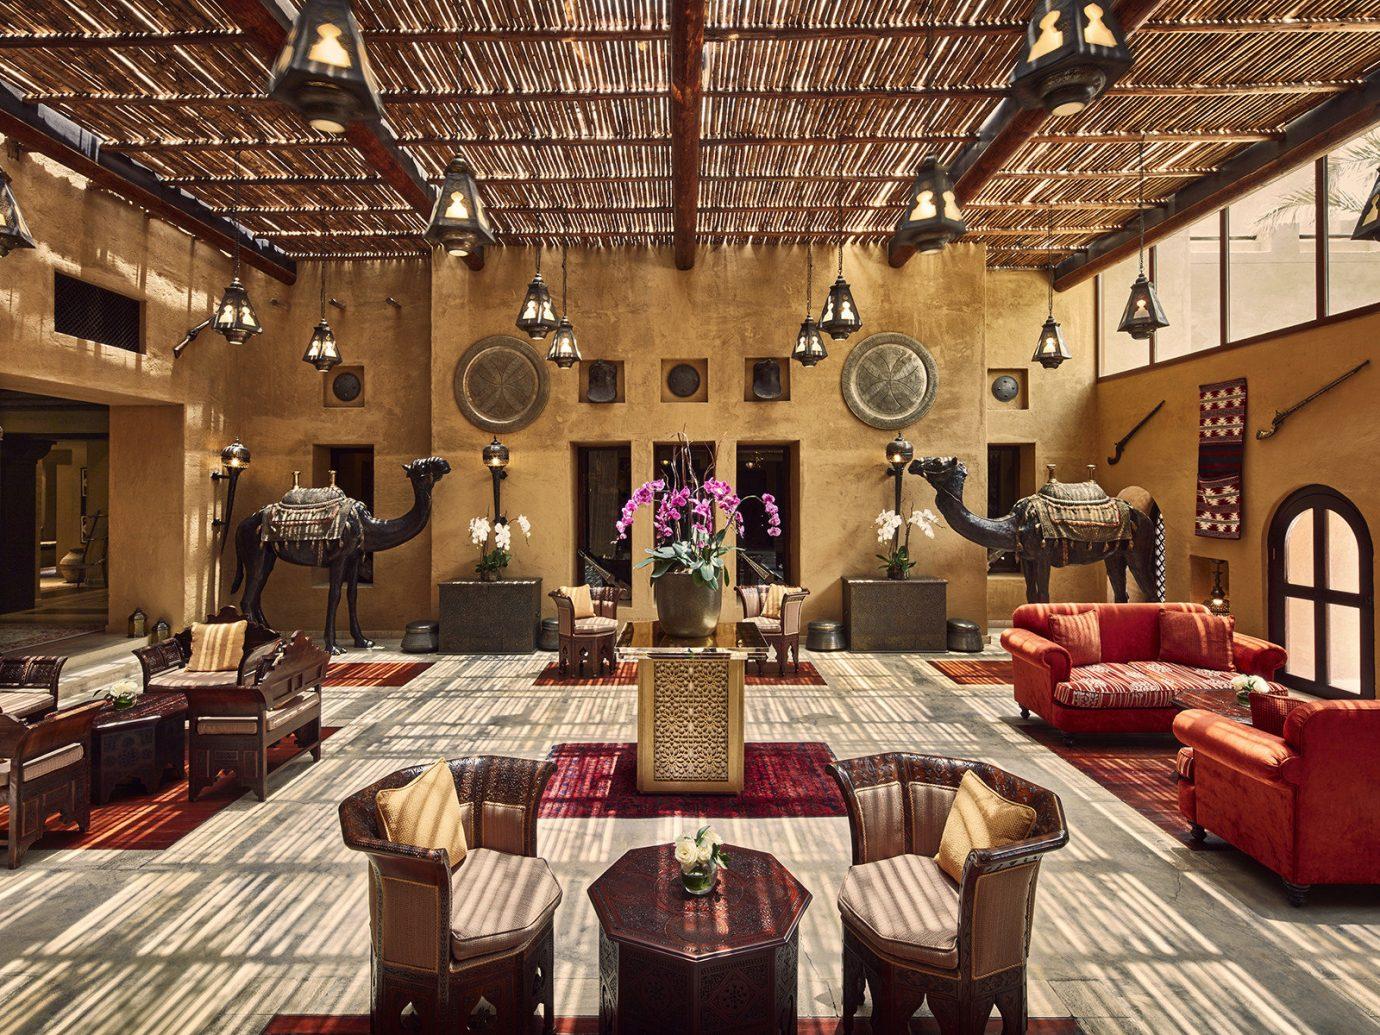 Dubai Hotels Luxury Travel Middle East indoor room interior design living room Lobby restaurant function hall furniture several